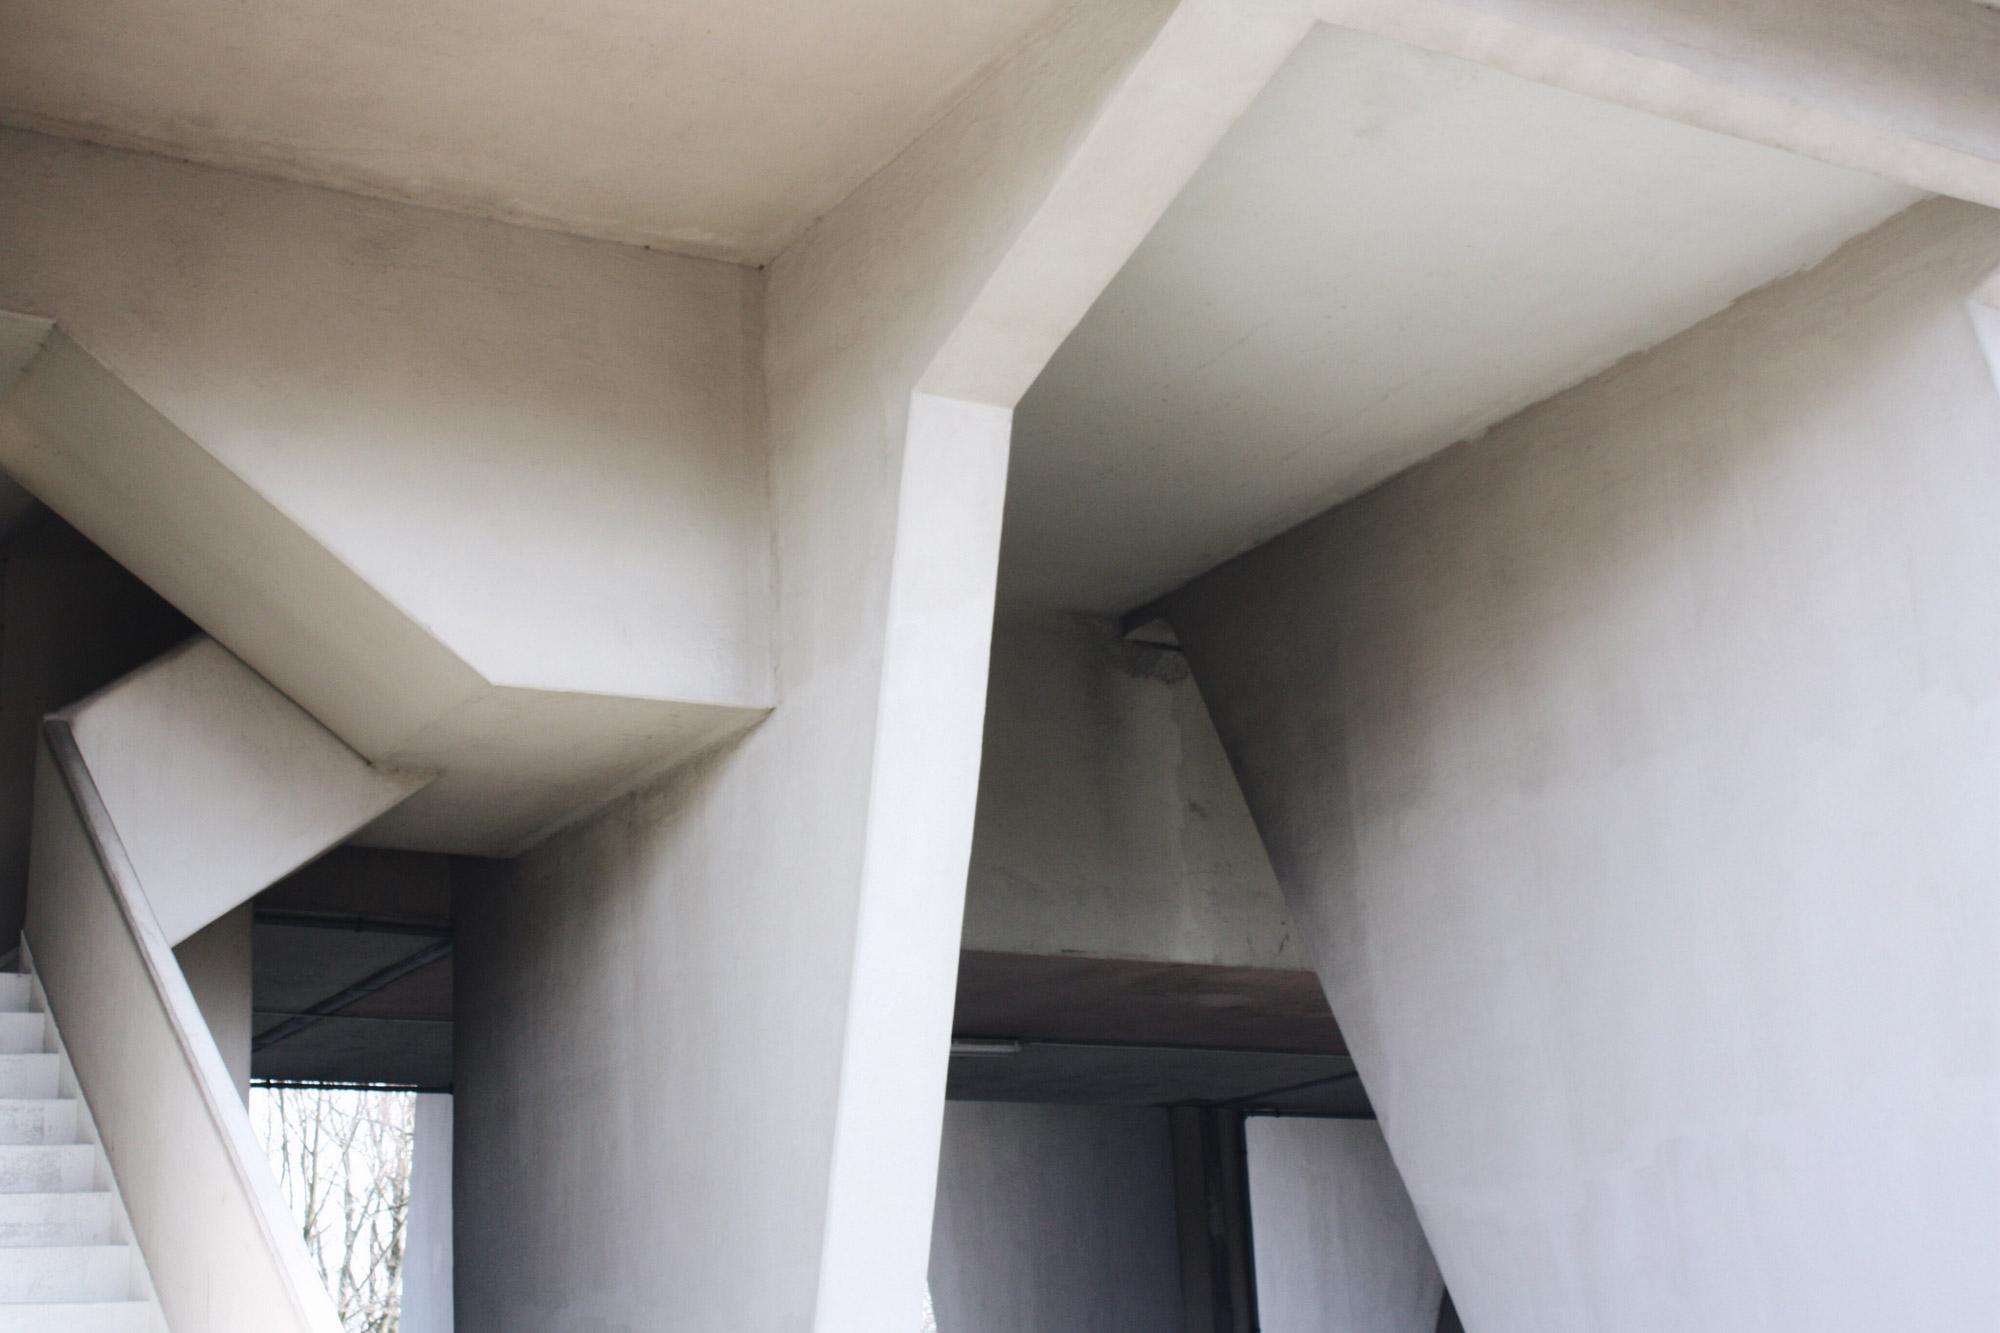 urbanbacklog-berlin-le-corbusier-unite-d-habitation-9.jpg